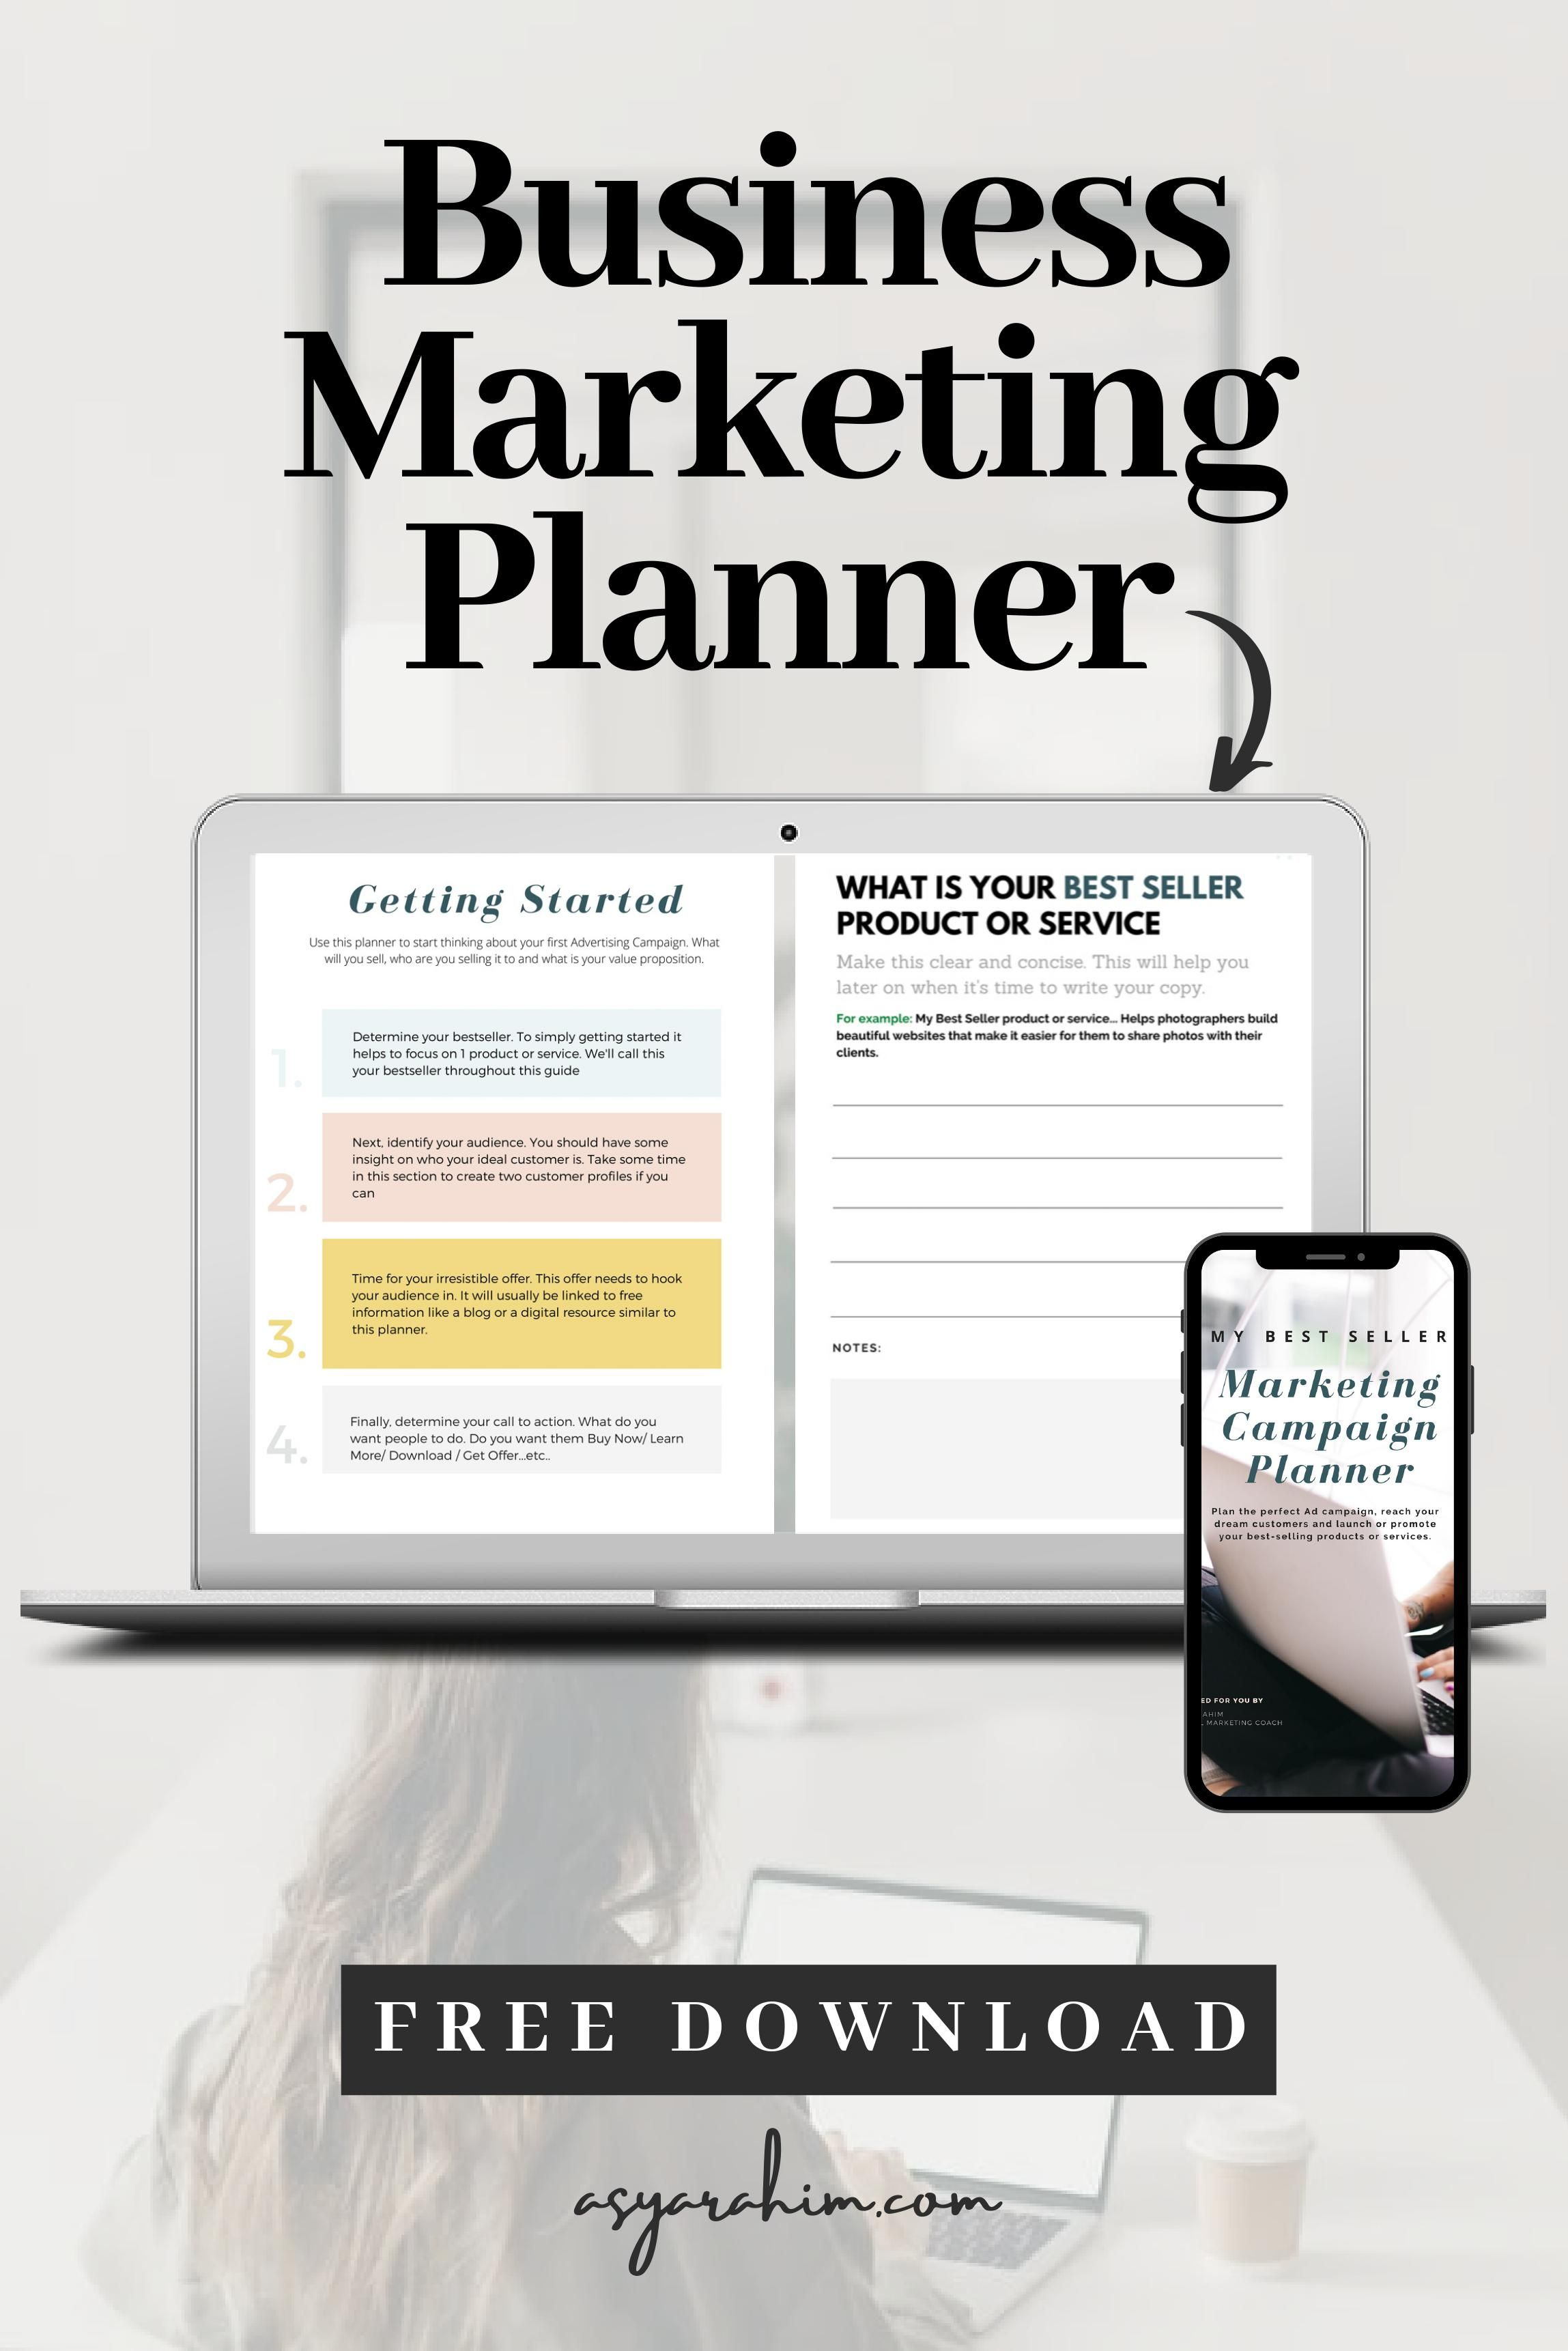 Business Marketing Planner Workbook Free Download Asyarahim Com In 2020 Facebook Marketing Strategy Marketing Planner Facebook Marketing